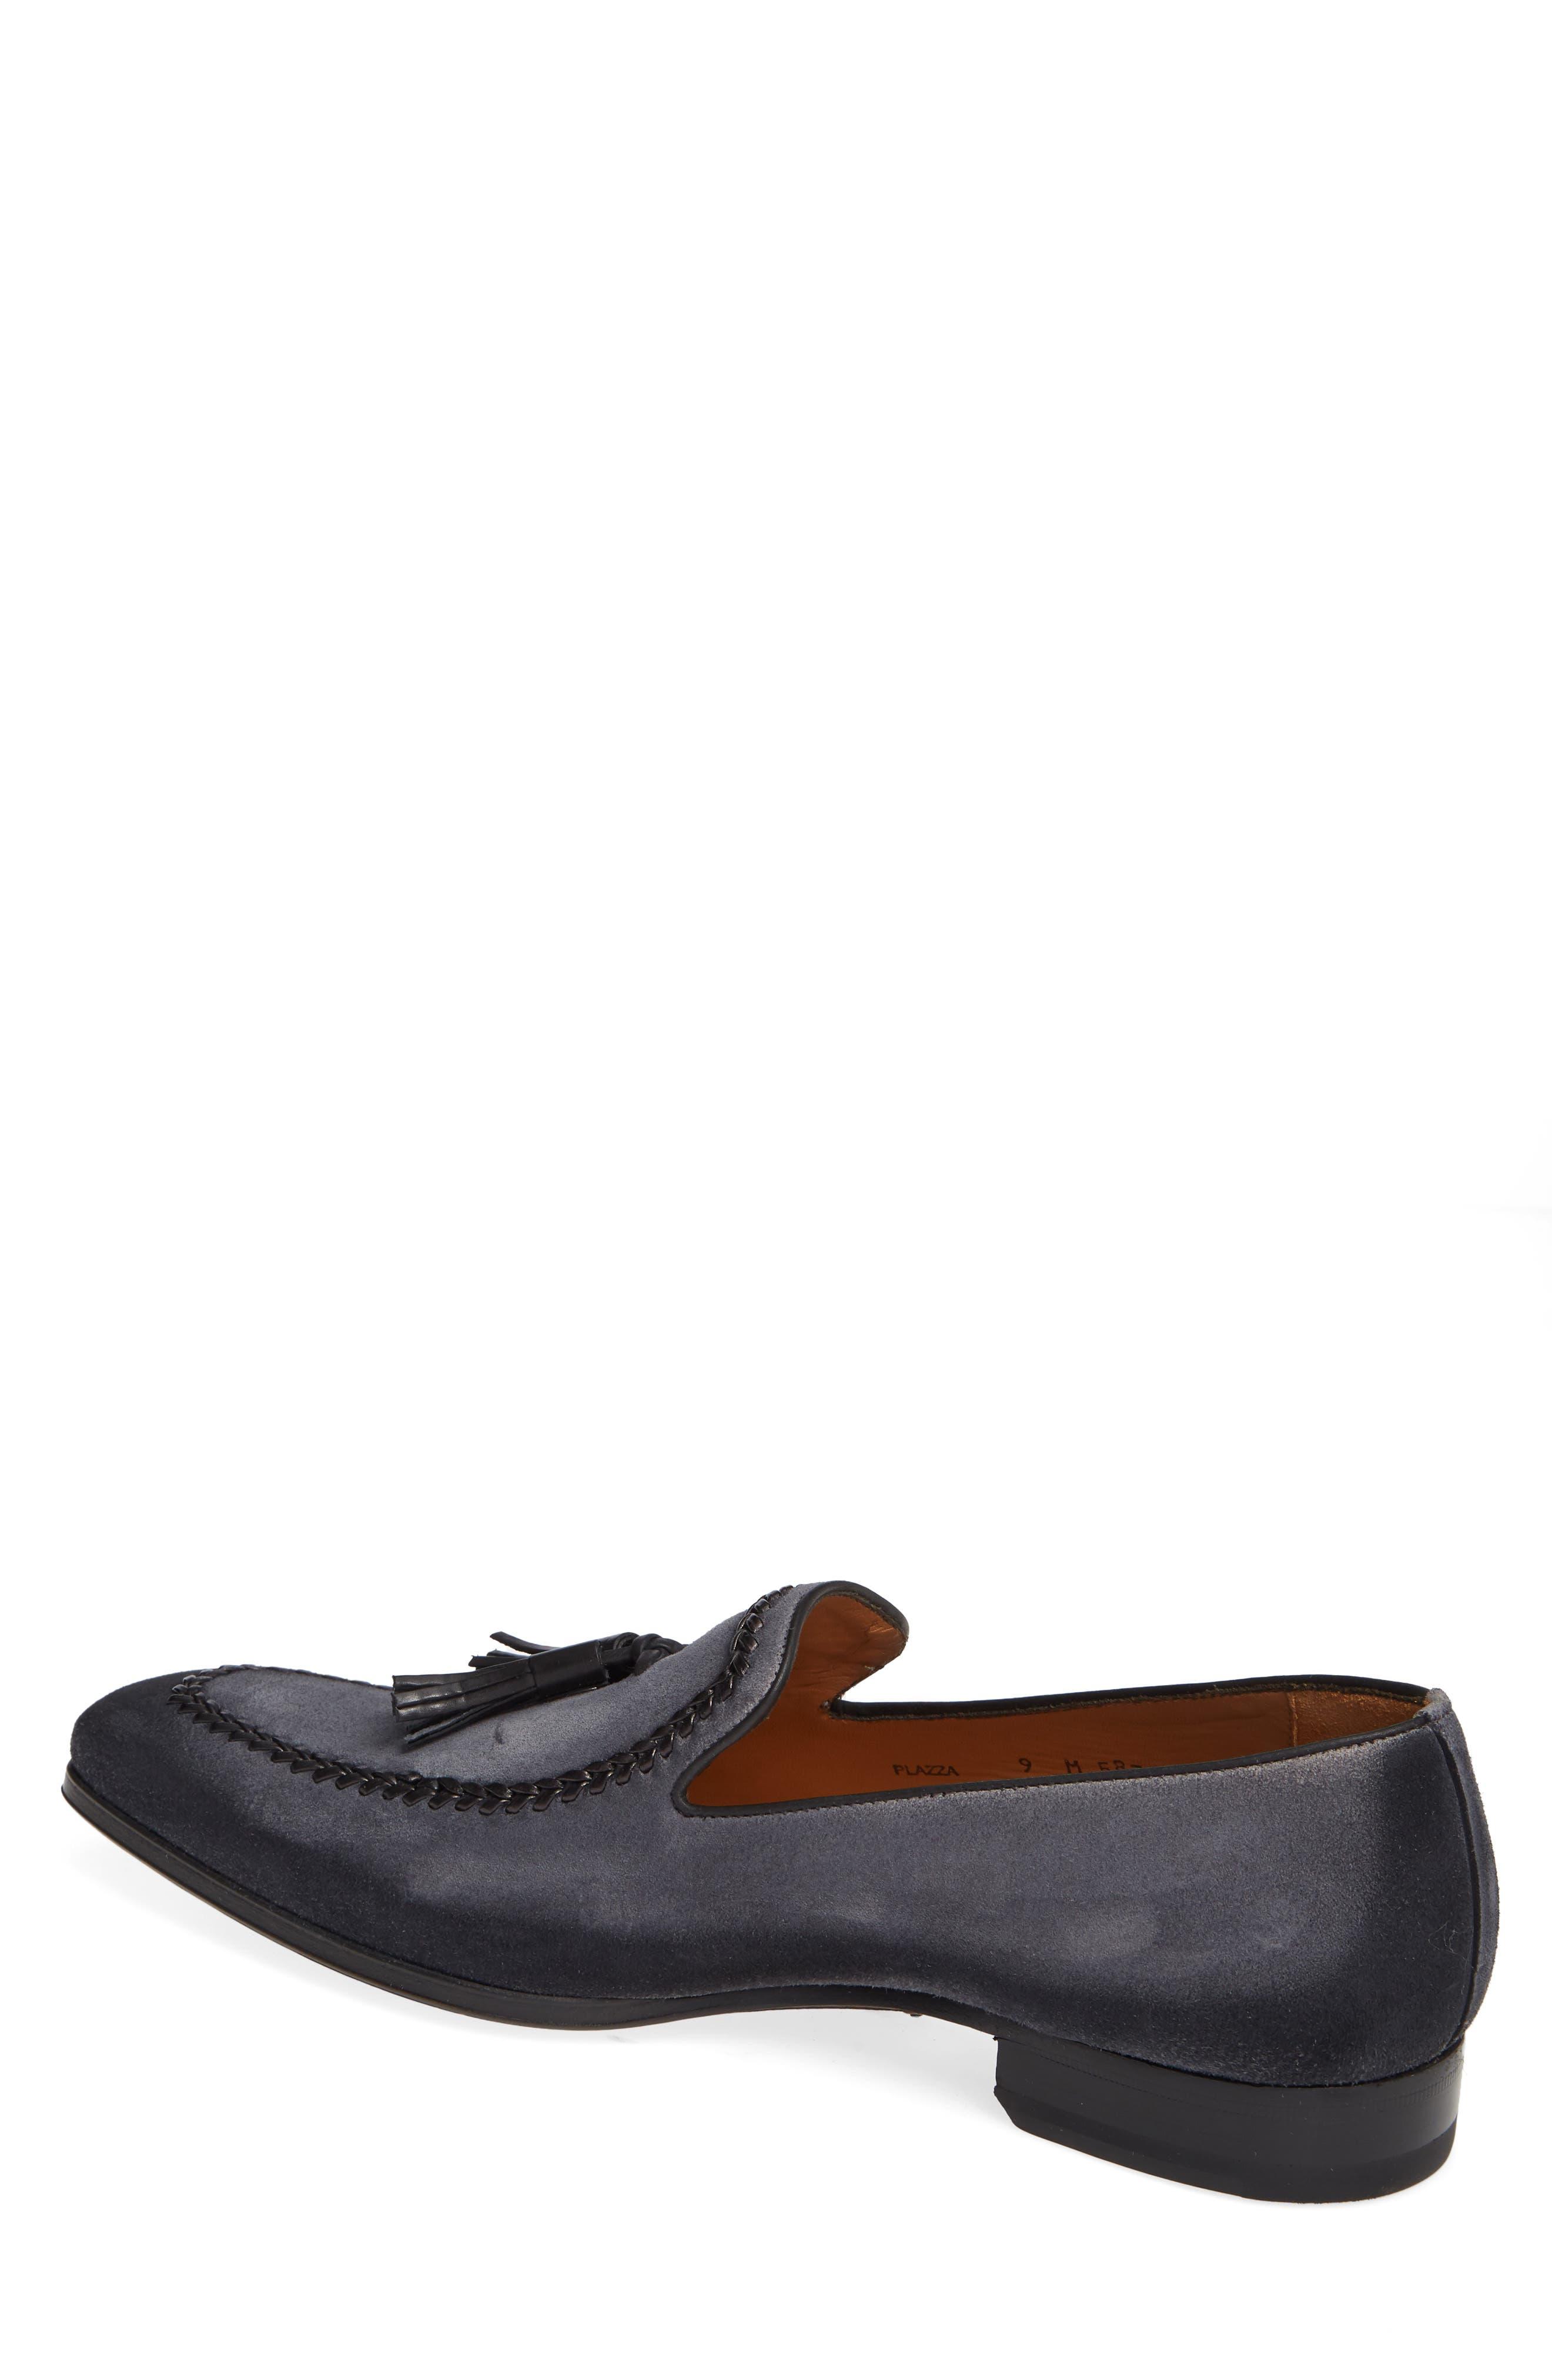 Plazza Tasseled Venetian Loafer,                             Alternate thumbnail 2, color,                             GREY SUEDE